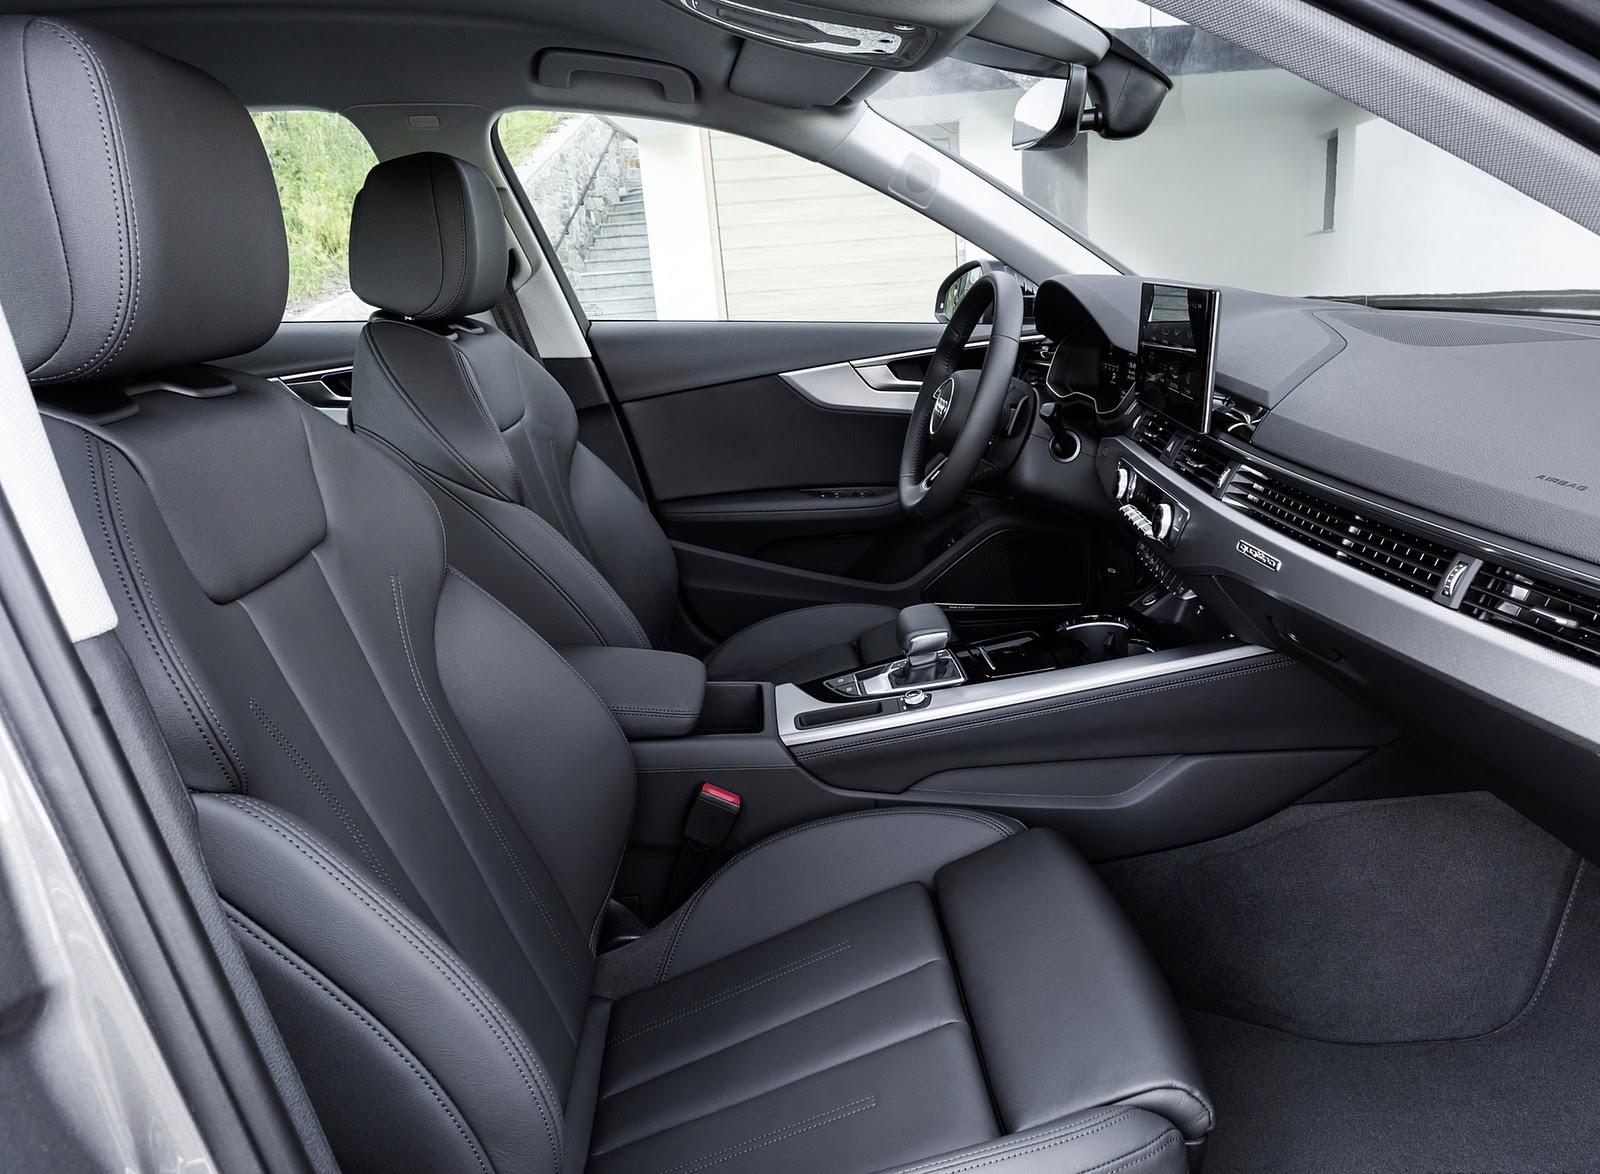 audi a4 2020 sedan interior - supercars gallery